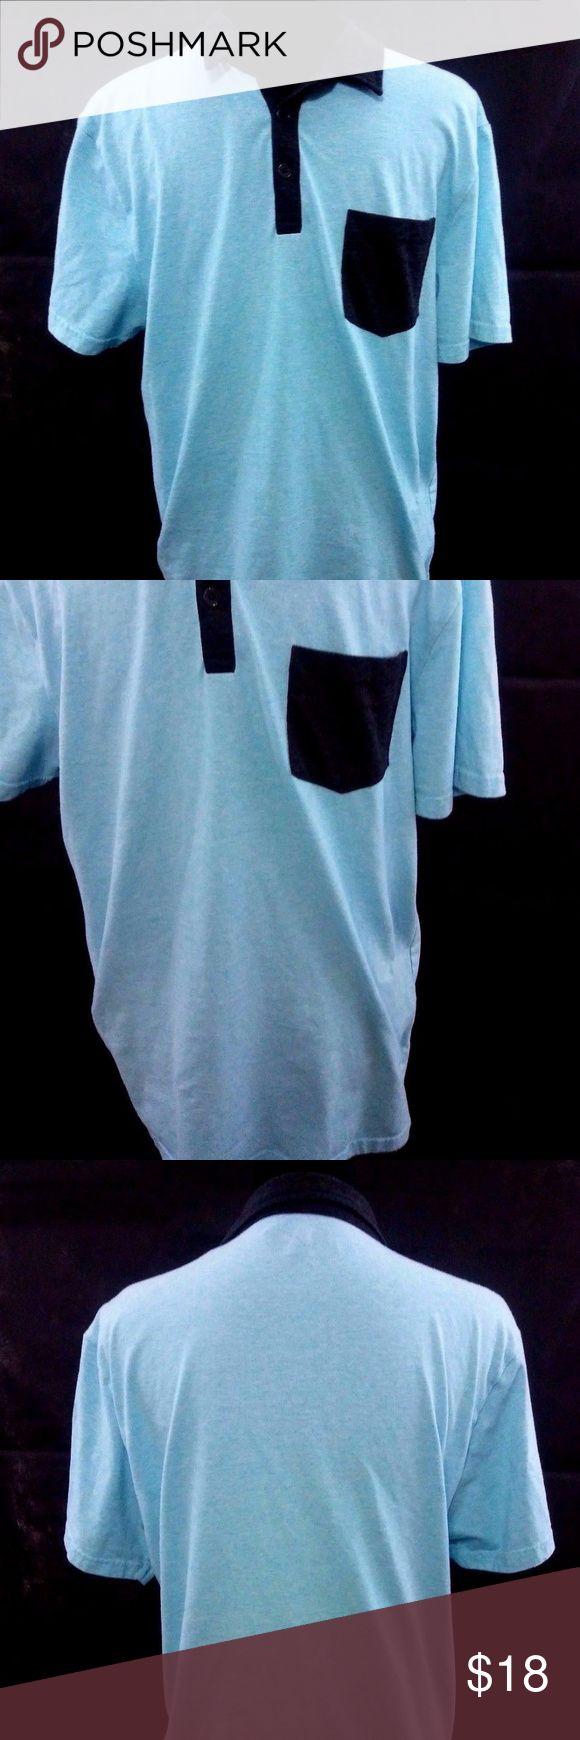 "Retrofit Men's Short Sleeve Polo SZ L Retrofit Brand Short Sleeve Polo L Blue Gray Single Pocket Casual Cotton Shirt  Approximate Measurements:  Pit to Pit: 40""* Shoulder to Shoulder: 18"" Length: 28.5"" Sleeve Length: 8.5""  Item is measured laying flat. Measurements with an asterisk * next to them have been doubled. Retrofit Shirts Polos"